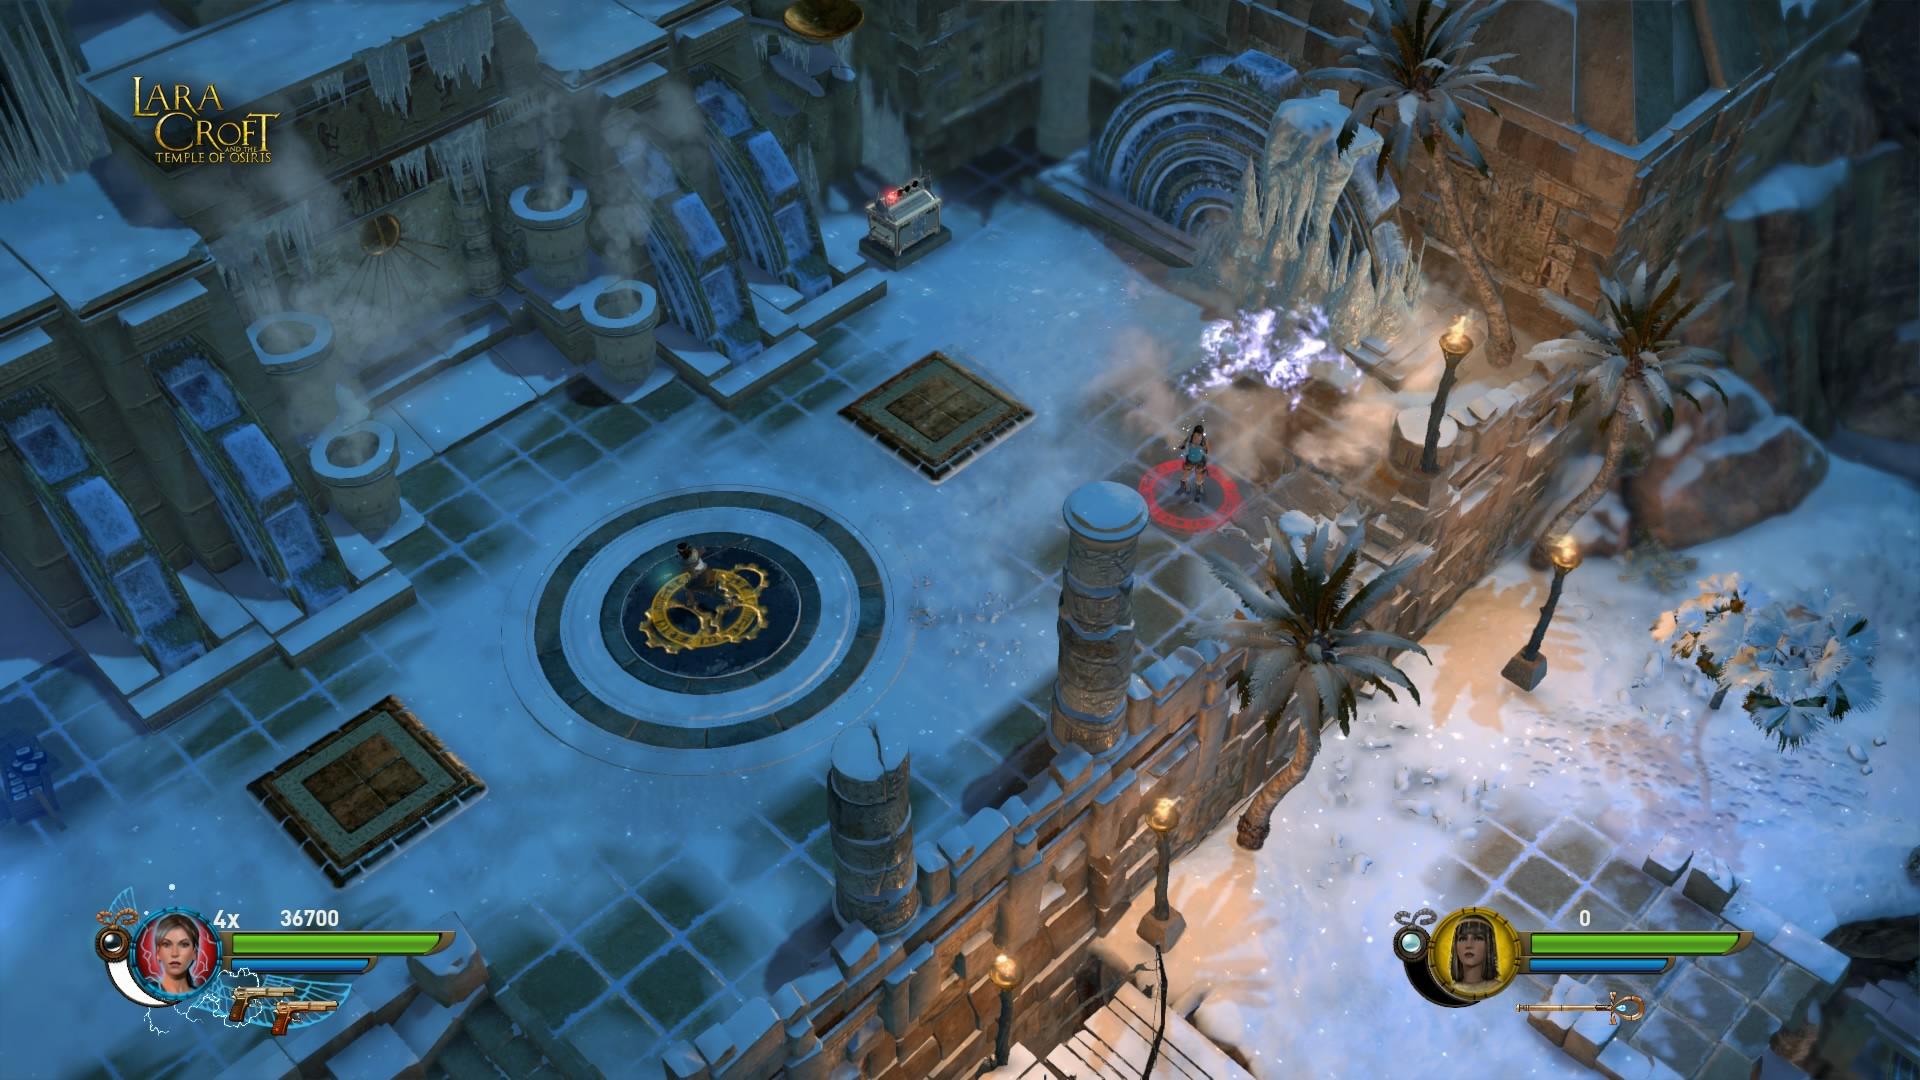 Lara Croft and the Temple of Osiris zdarma na Steamu